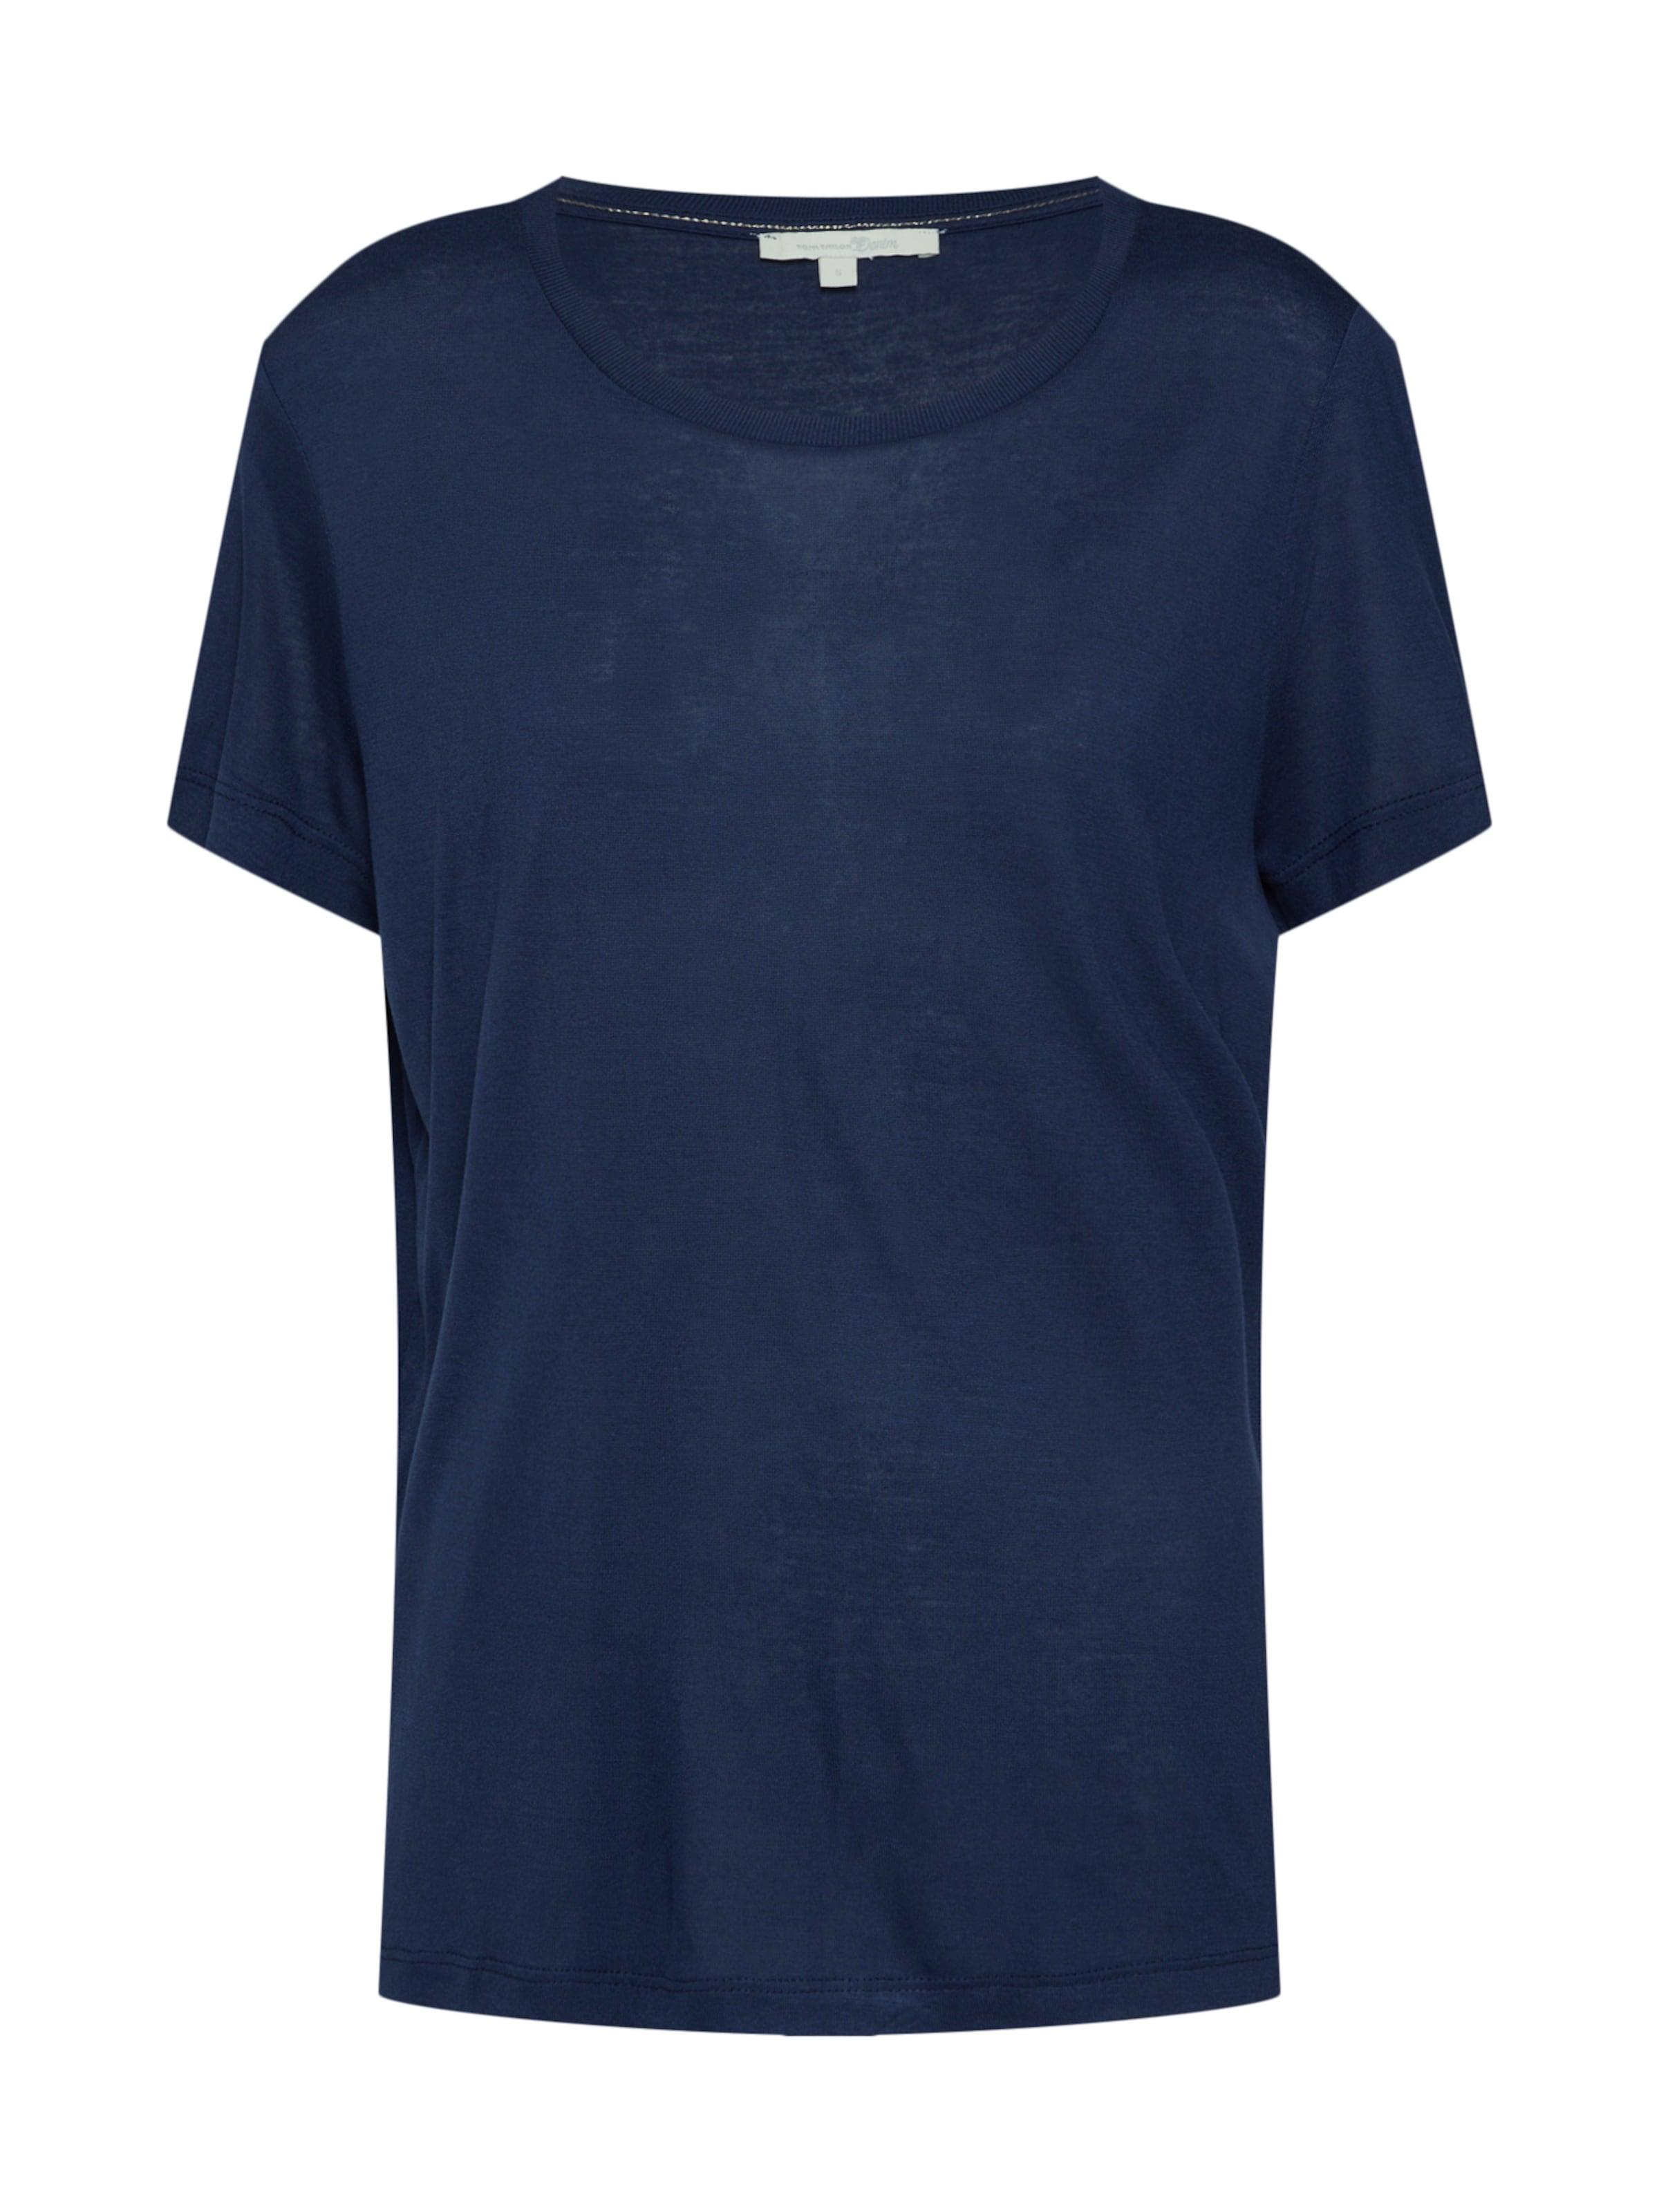 shirt T Denim Bleu Tom En Tailor Marine gYbf7y6